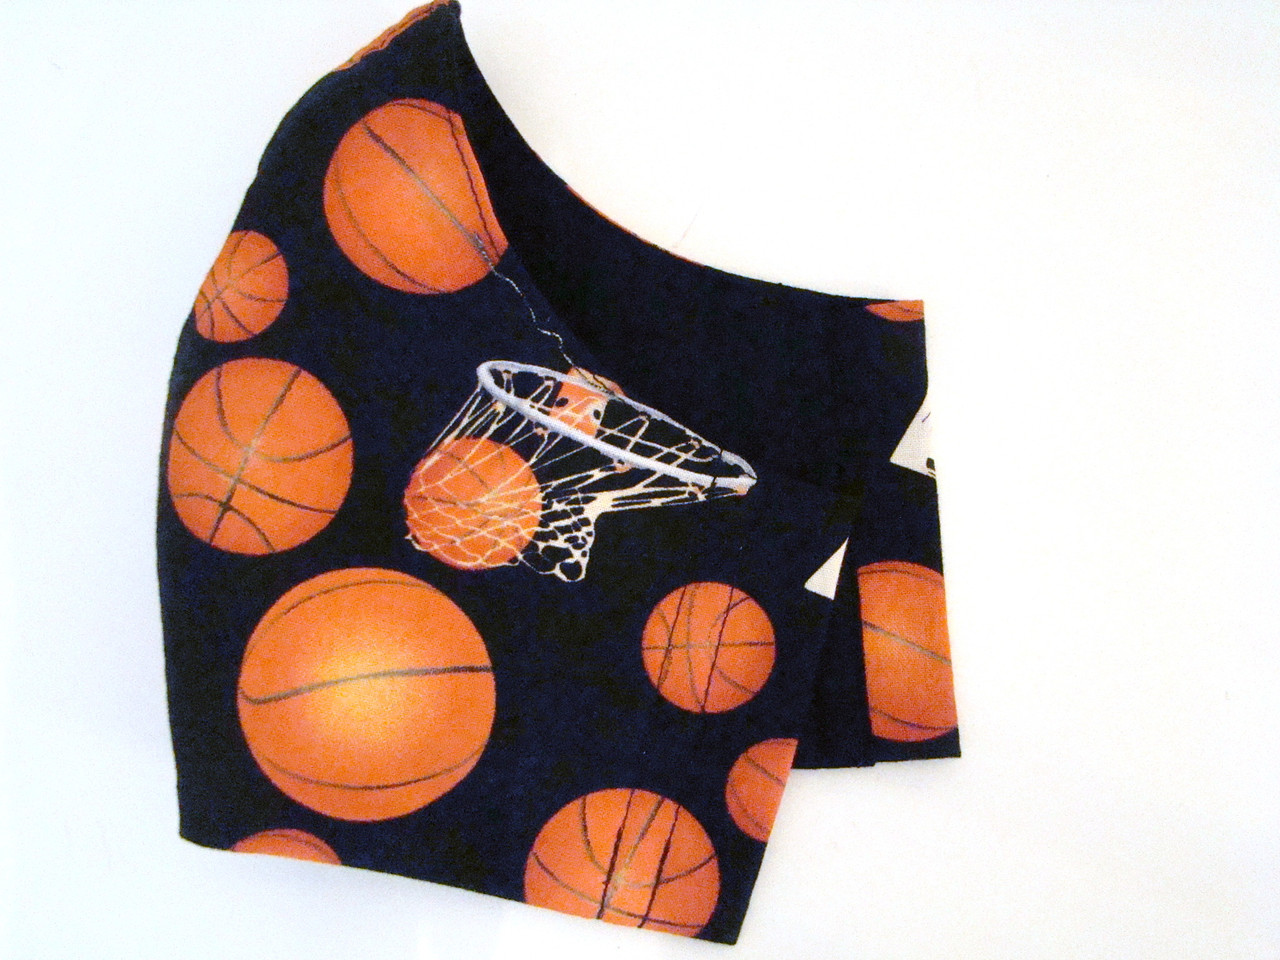 Basketball and Hoops (FM-BASKETBALL-HOOPS)